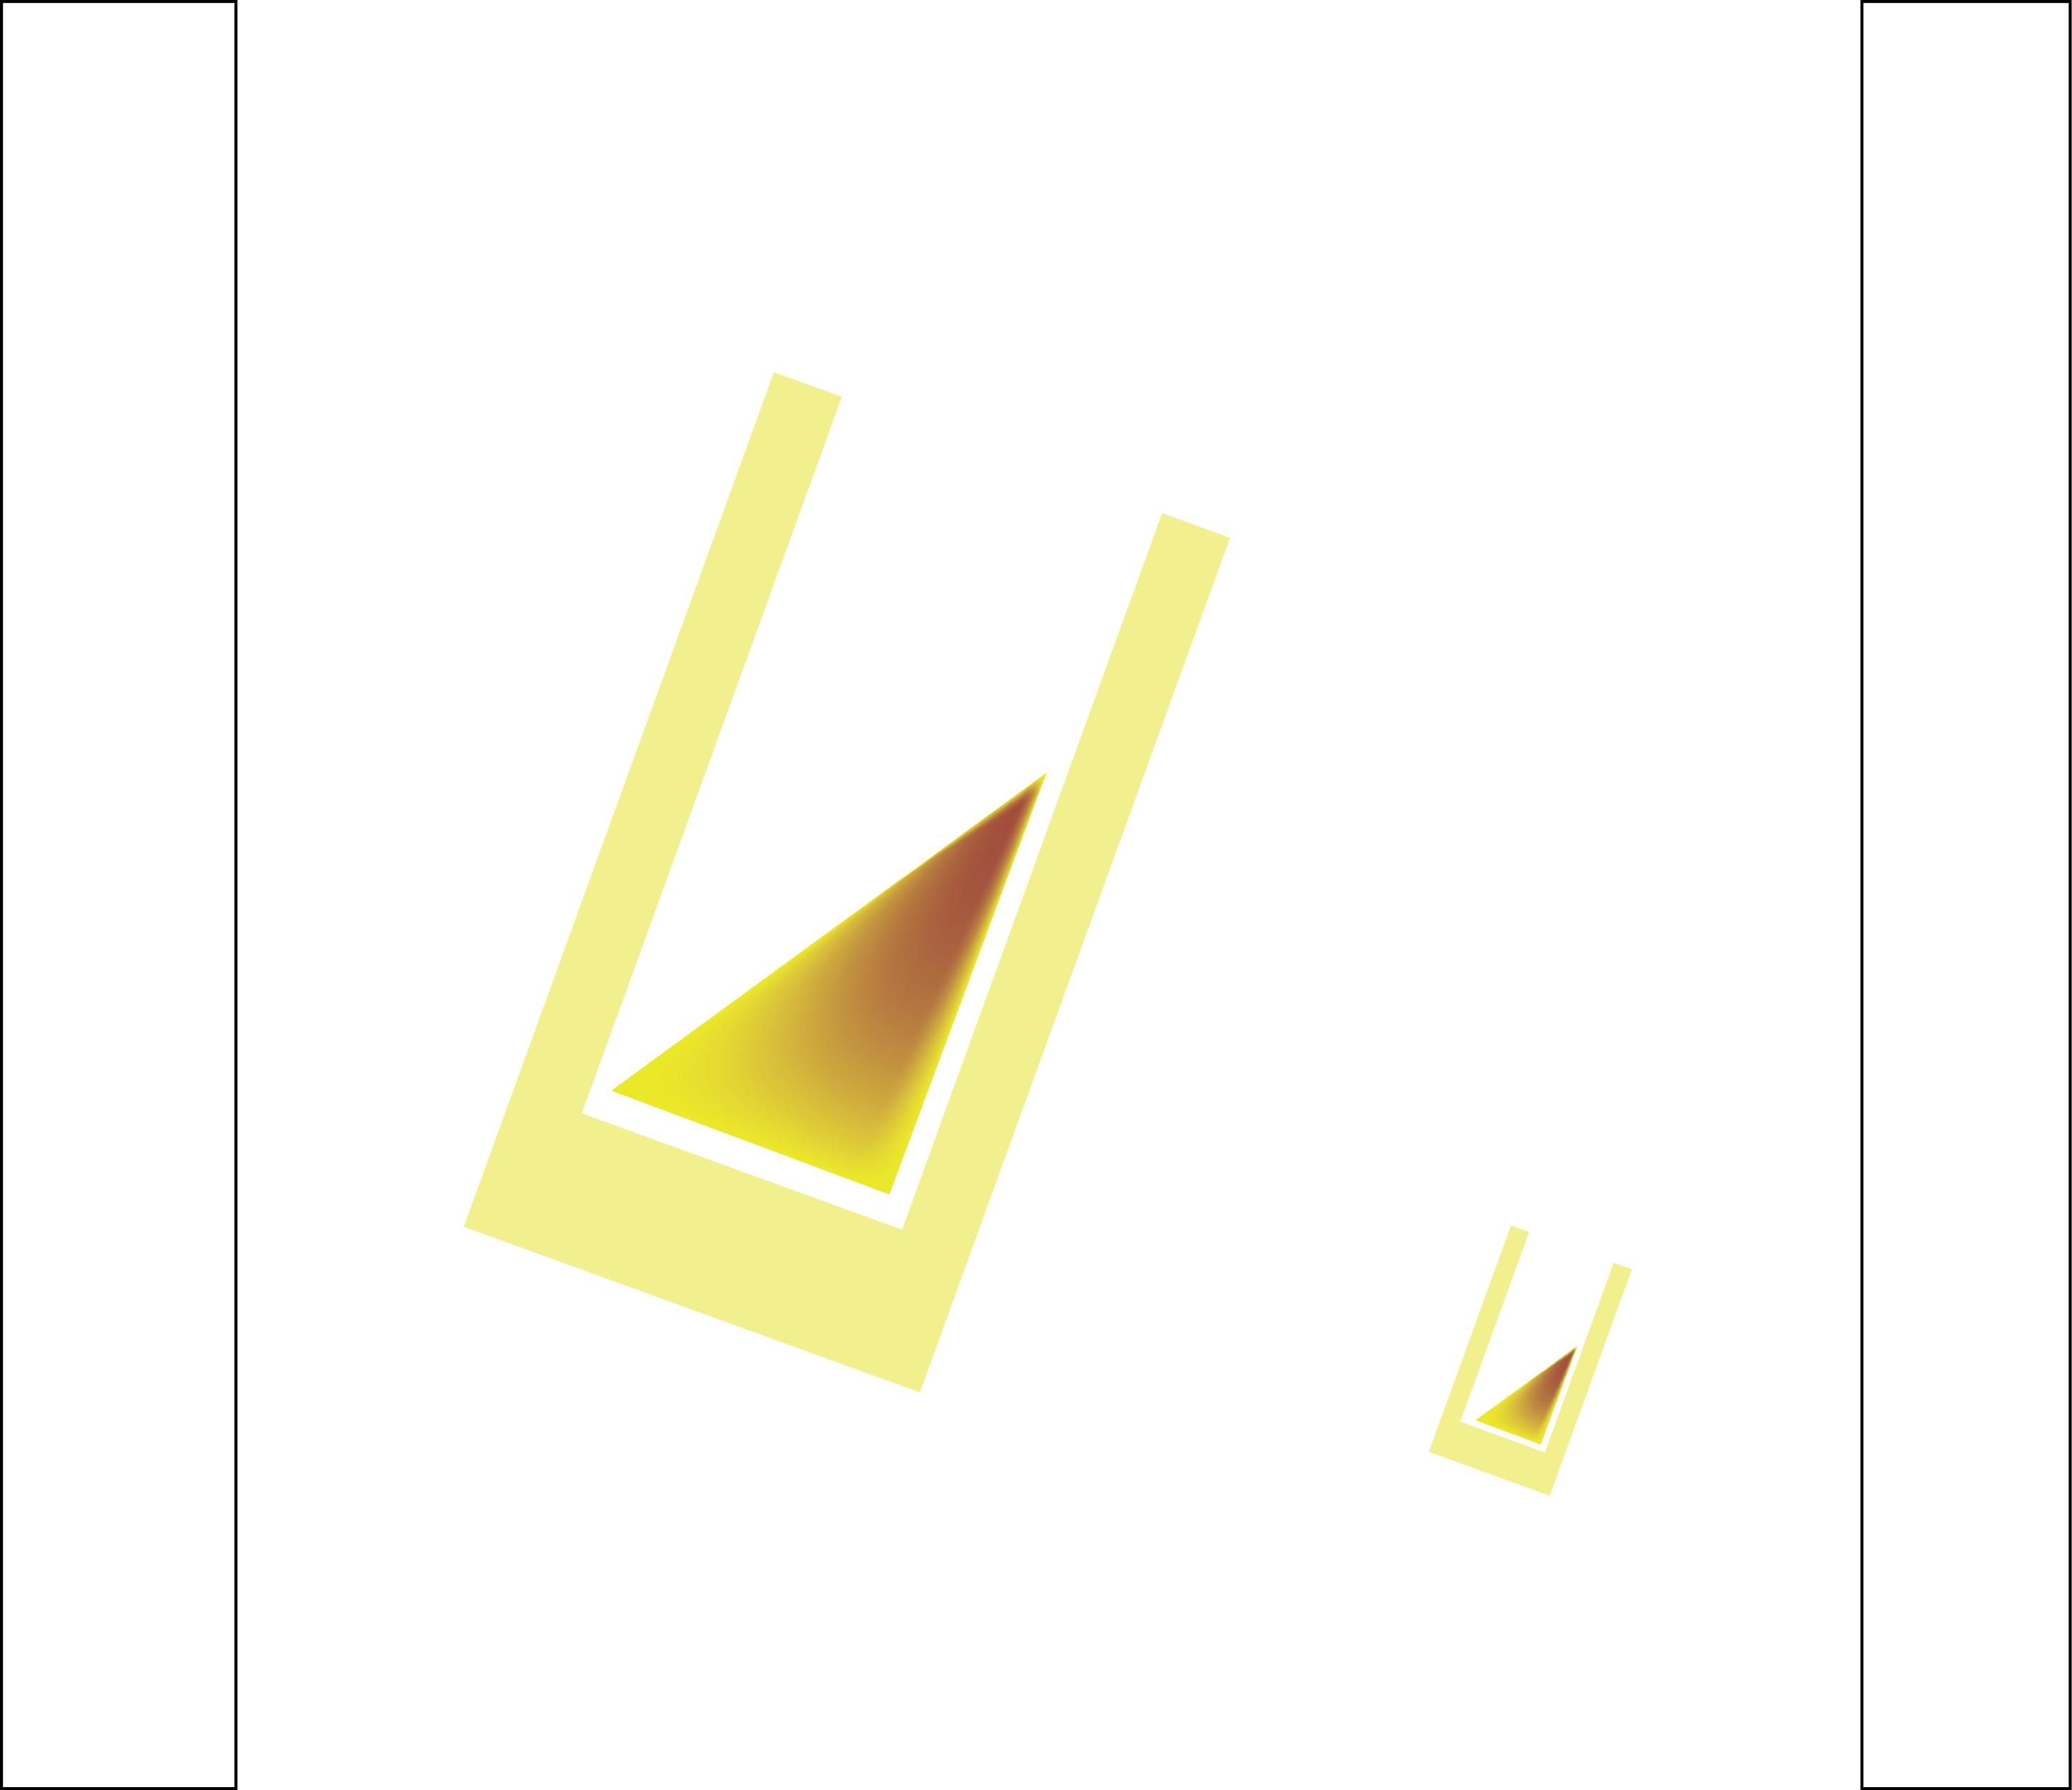 Logo Design by Private User - Entry No. 137 in the Logo Design Contest Creative Logo Design for SULBEV.